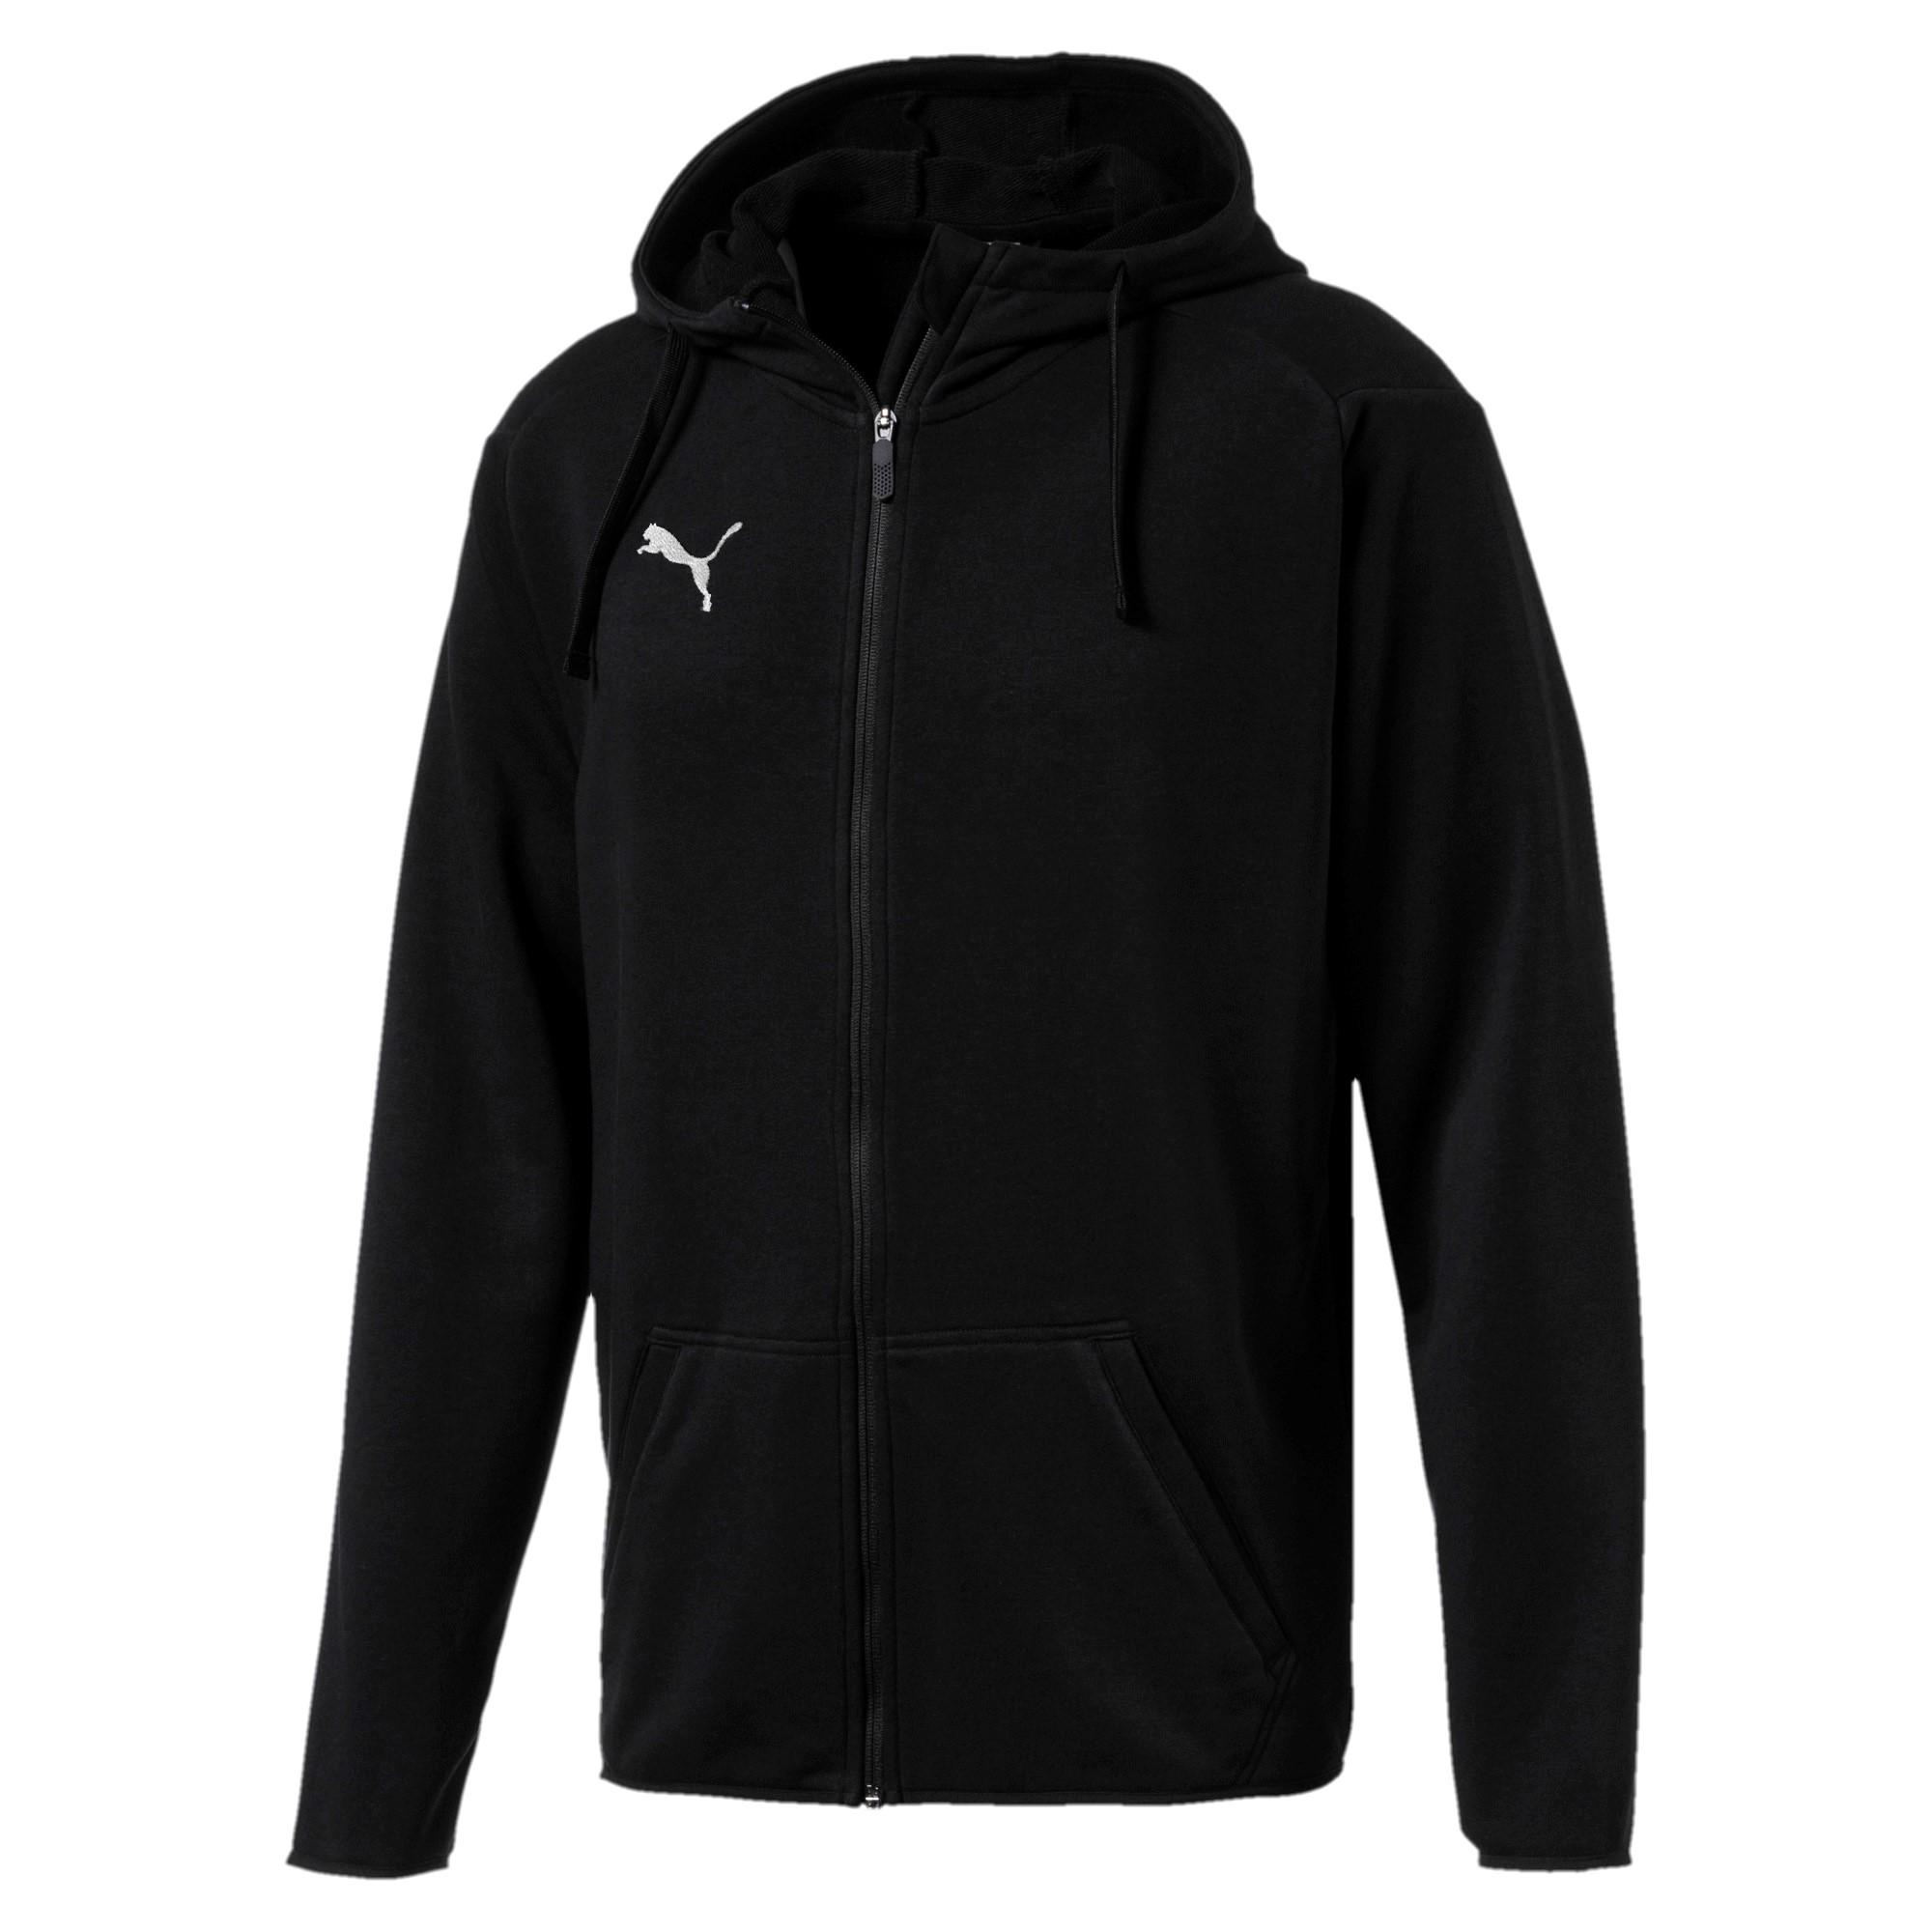 Ligua Casual Hoody Jacket black (prix adultes/ juniors)